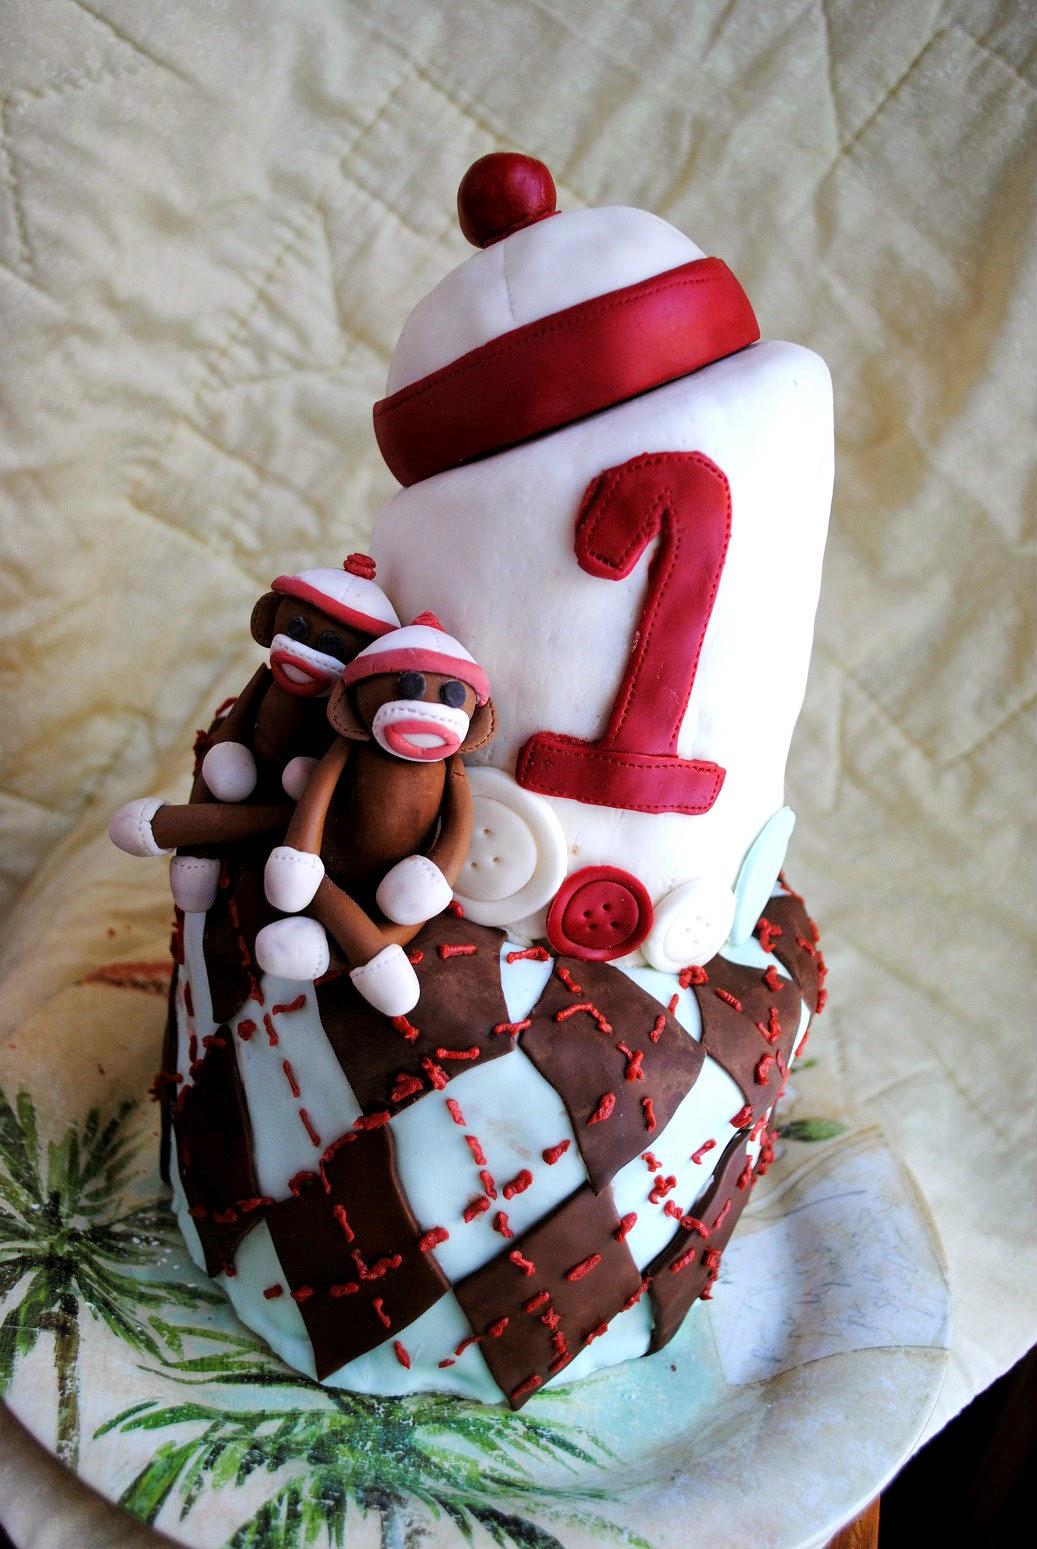 Sugar Blossom Cake Company Topsy Turvy First Birthday Cake